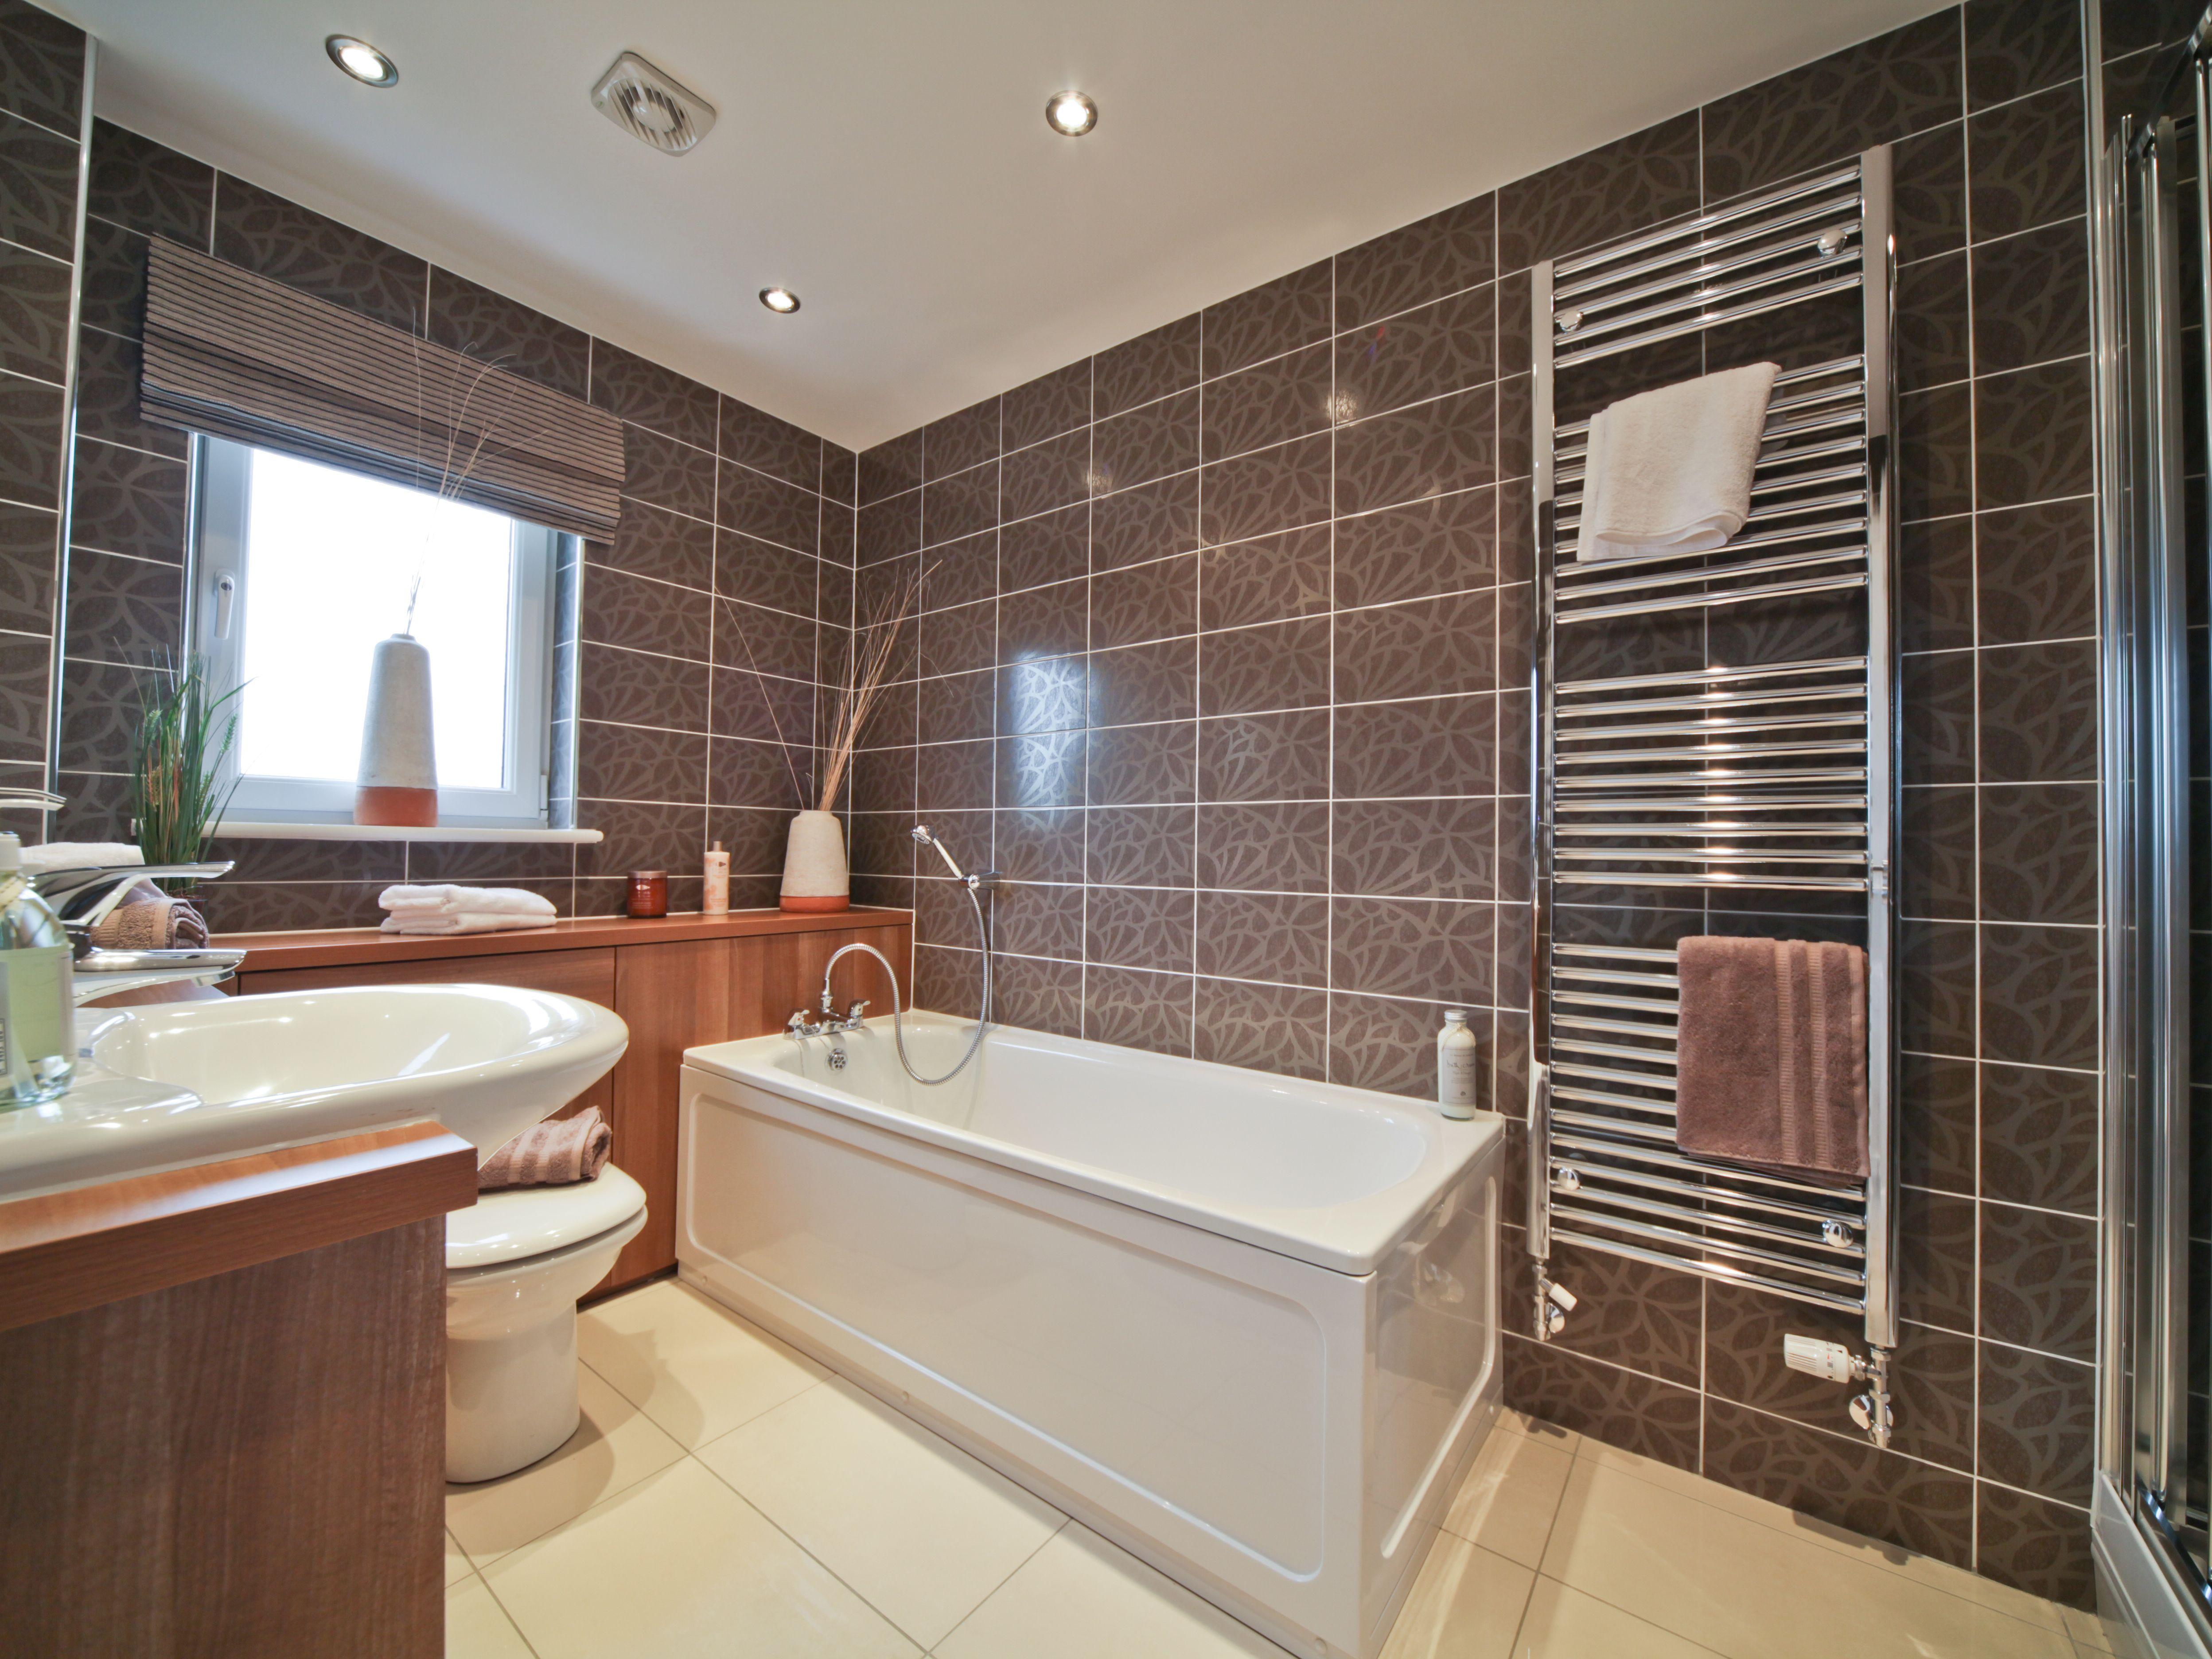 a typical taylor wimpey bathroom bathroom ideas pinterest a typical taylor wimpey bathroom bathroom ideas pinterest surrey squares and house